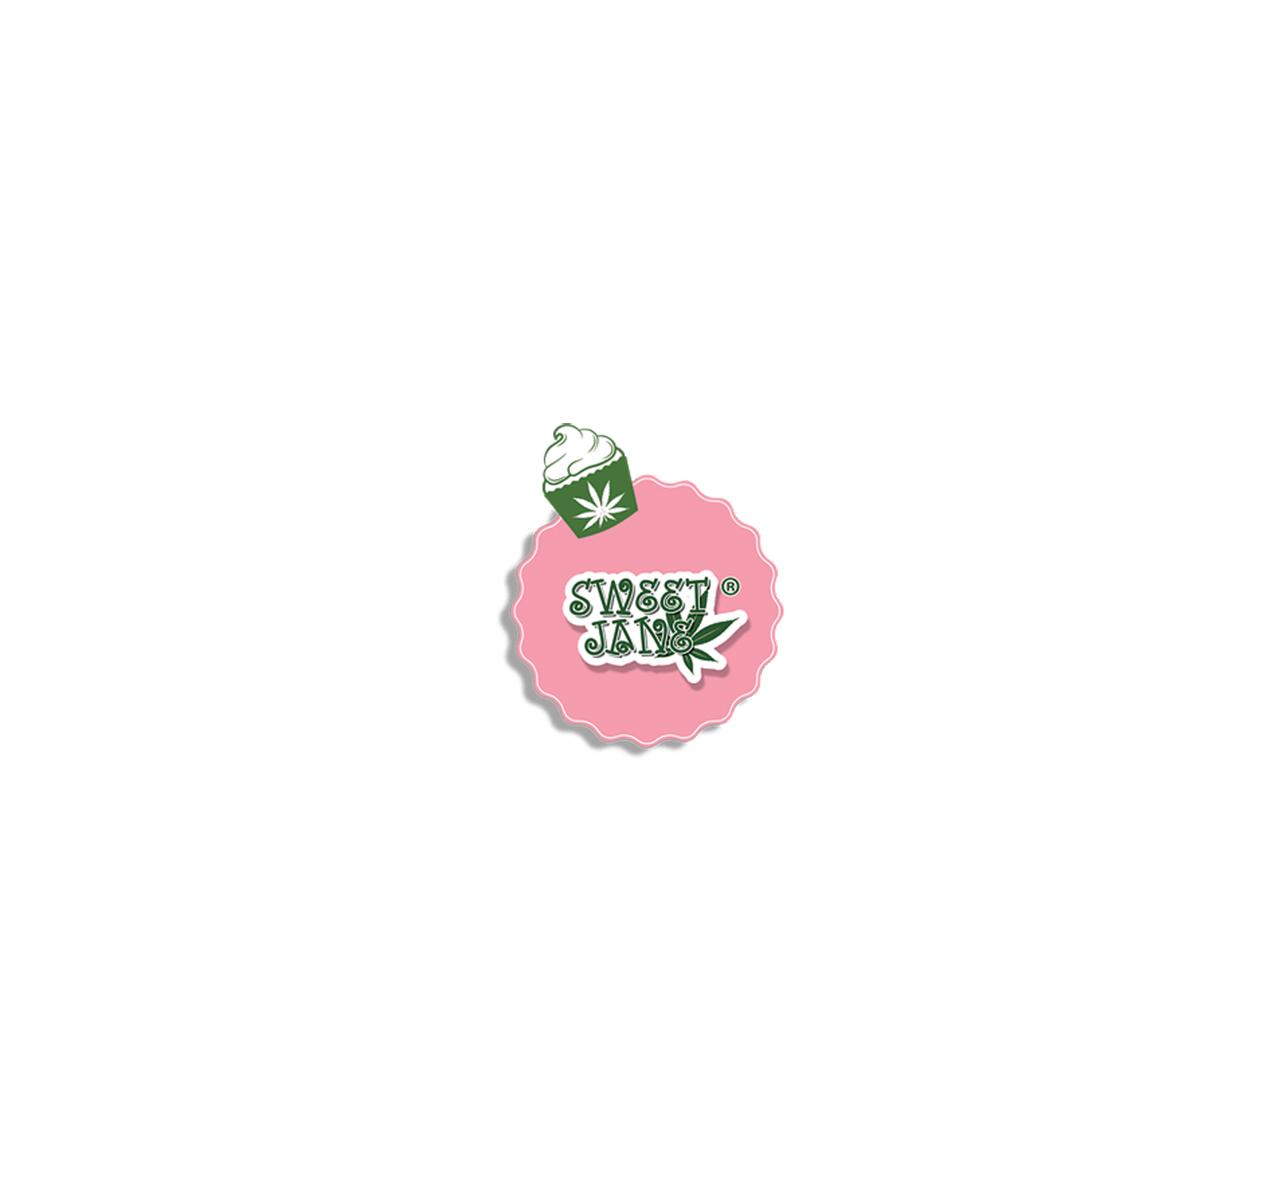 Sweet Janes logo